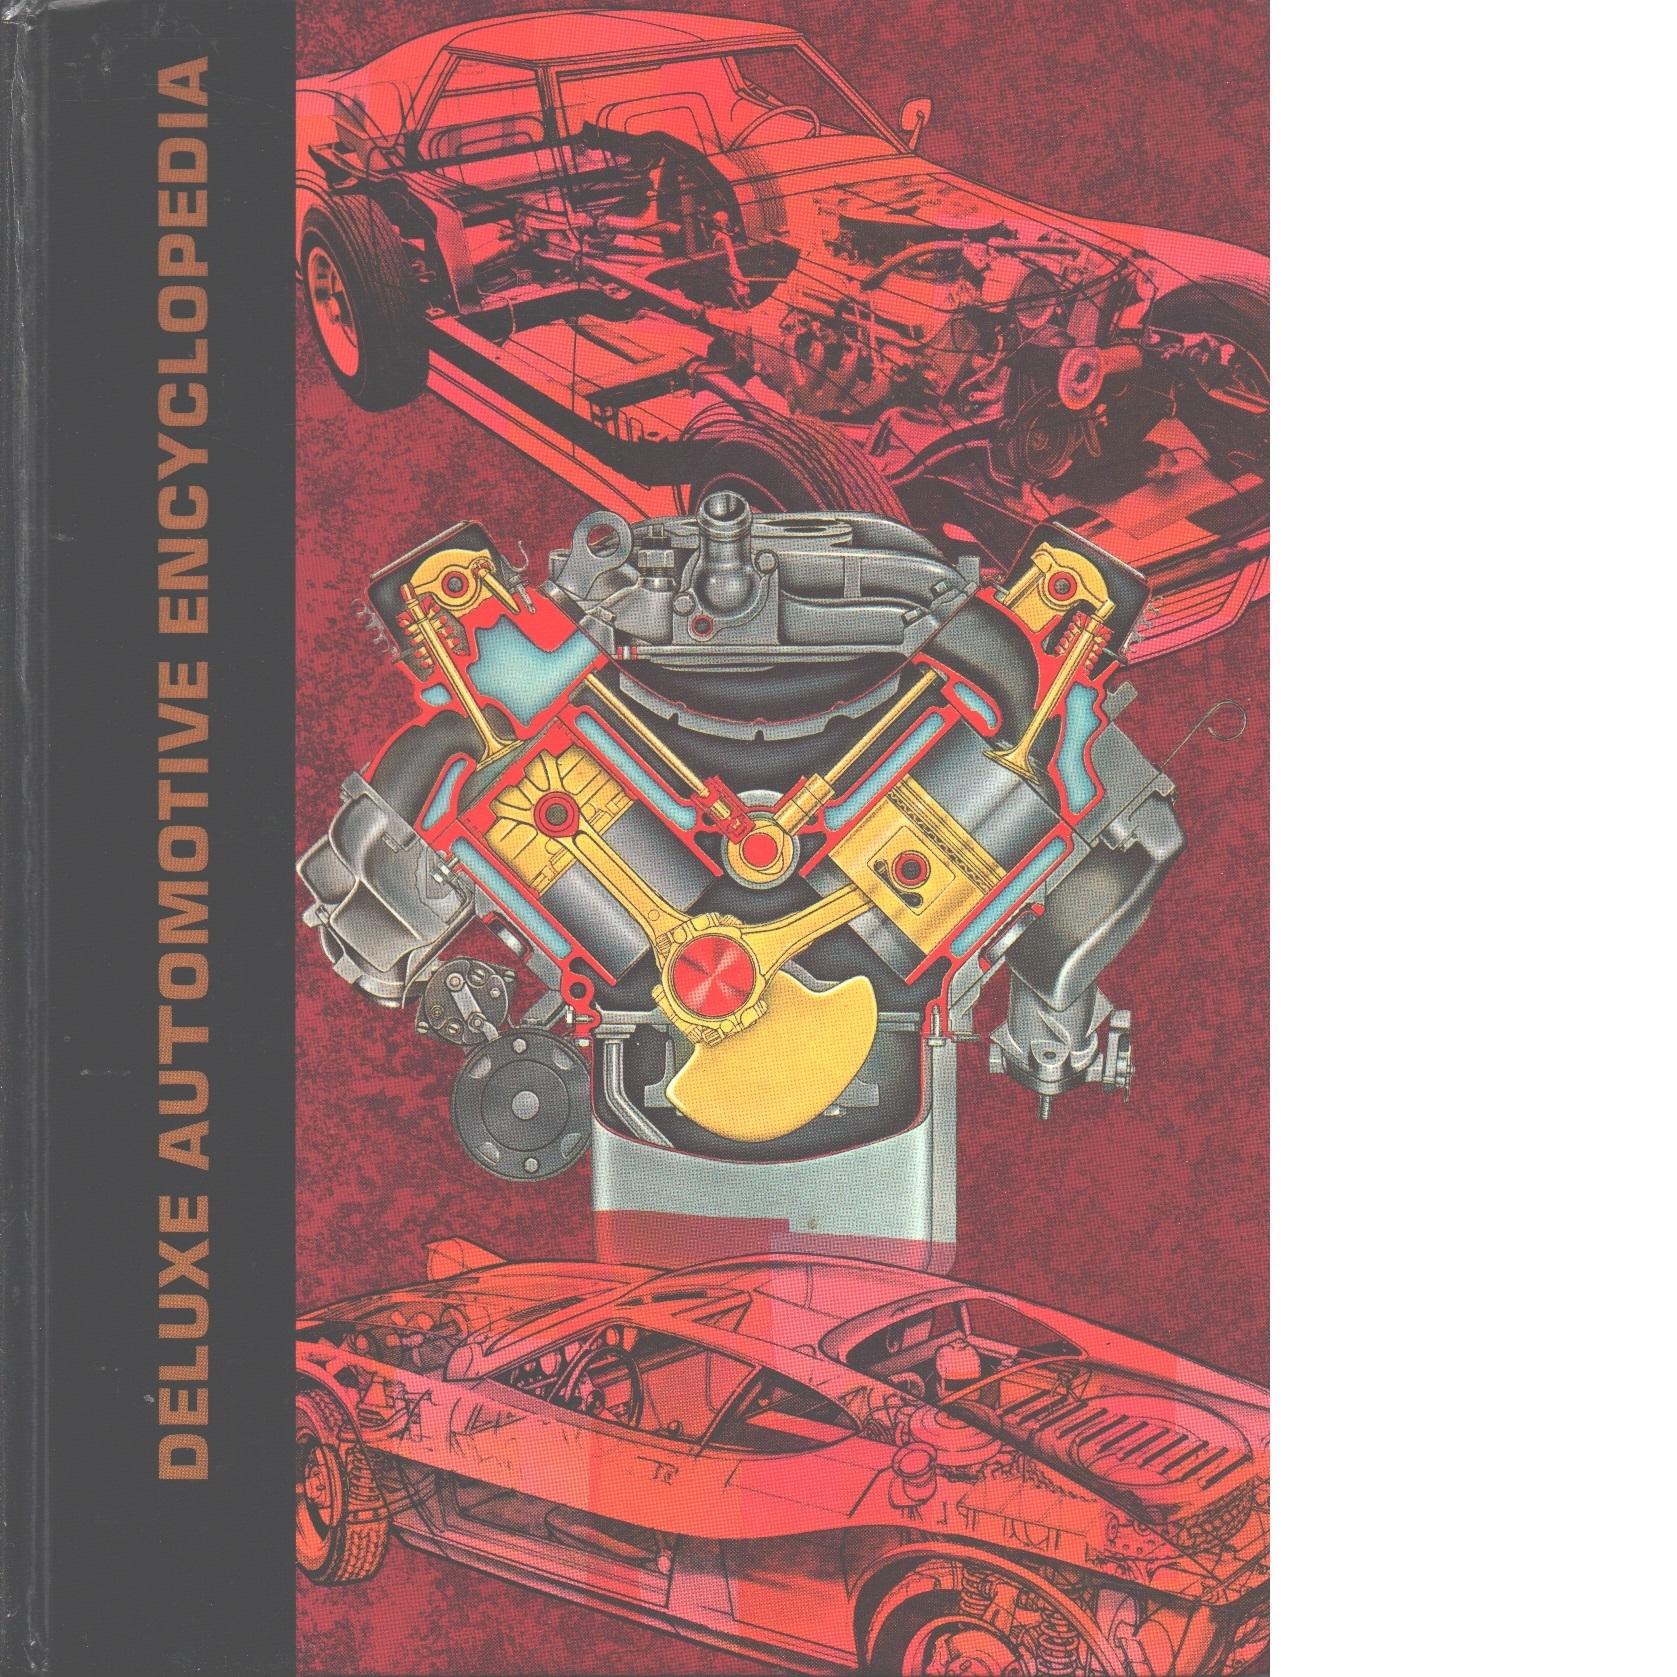 Deluxe automotive encyclopedia - Toboldt, William K and  Johnson, Larry